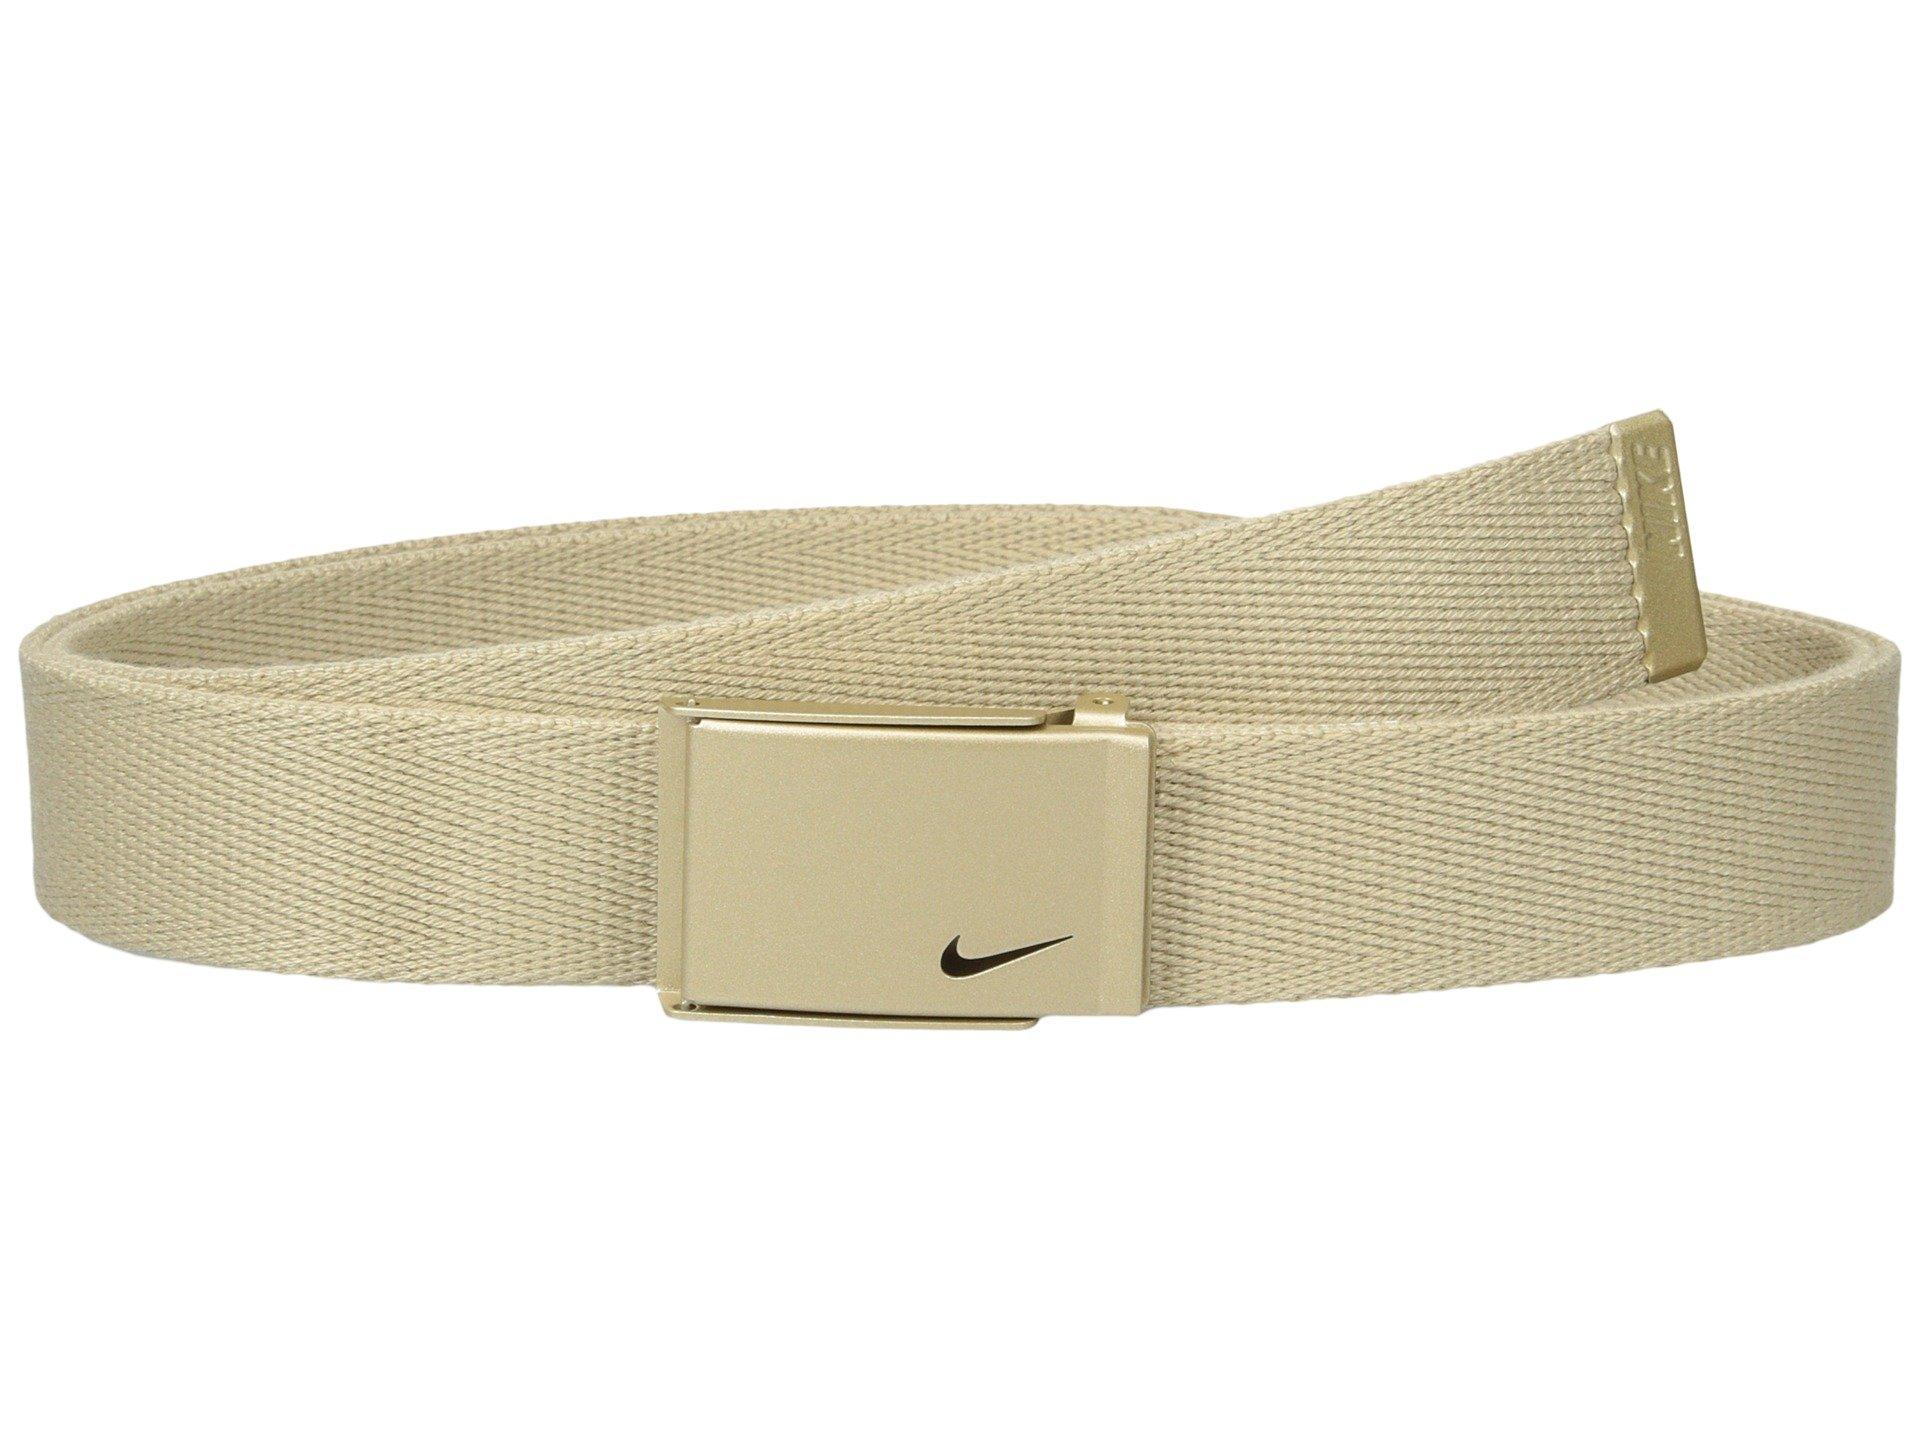 Correa o Cinturon para Mujer Nike Metallic Single Web  + Nike en VeoyCompro.net